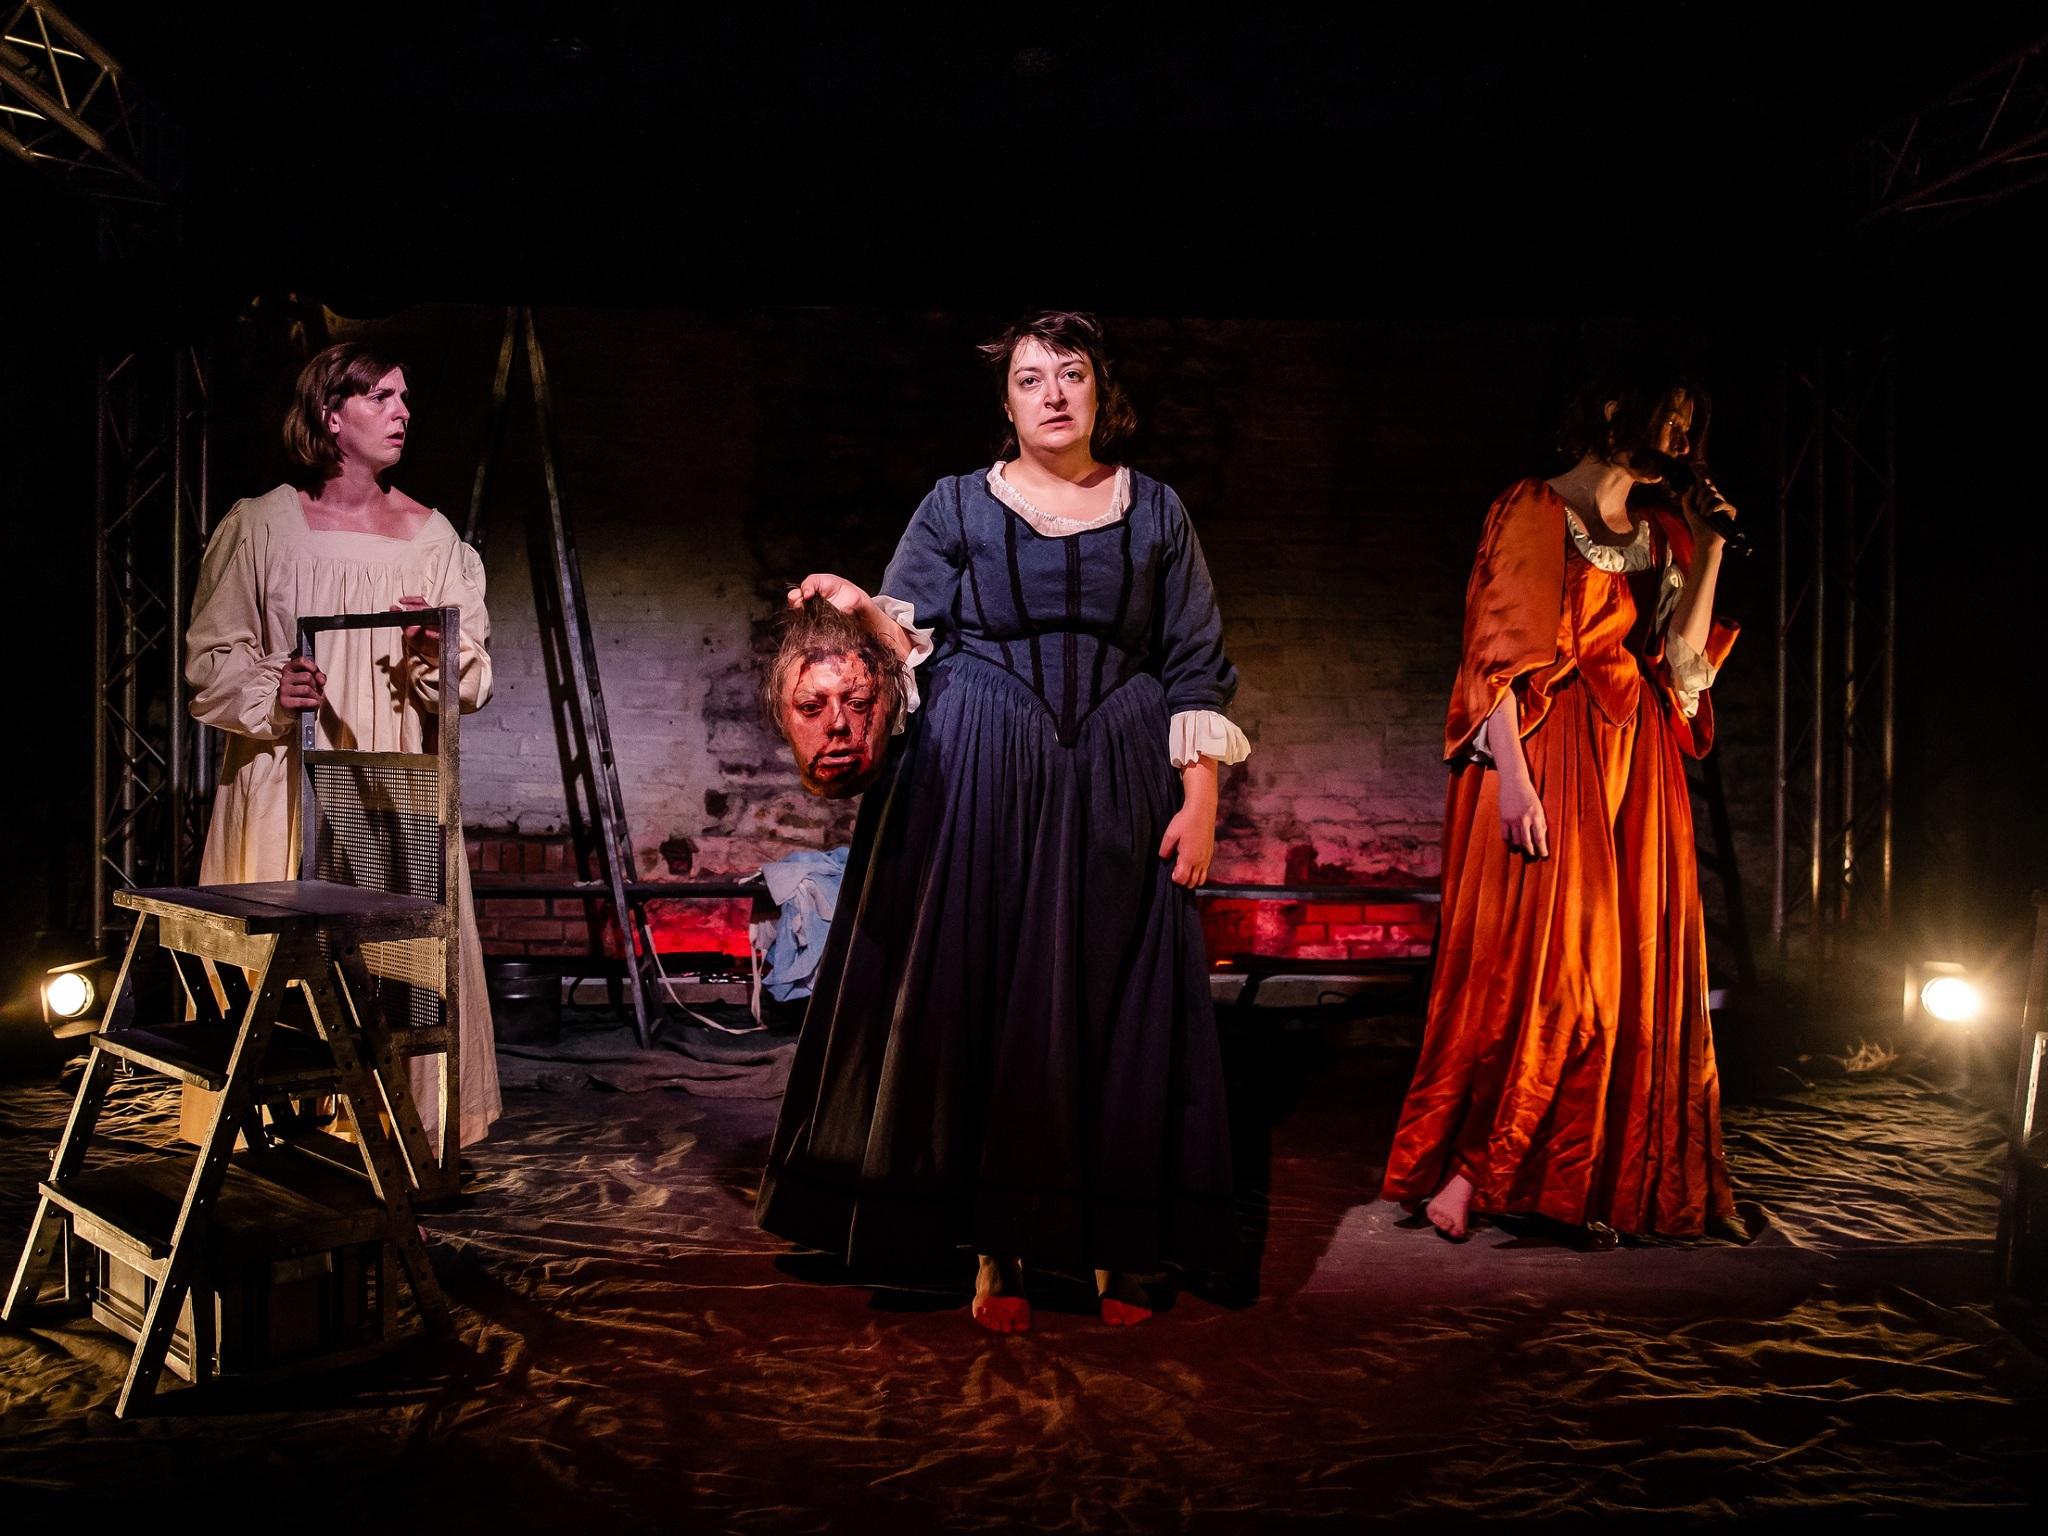 Teatro, It's True, It's True, It's True, Breach Theatre